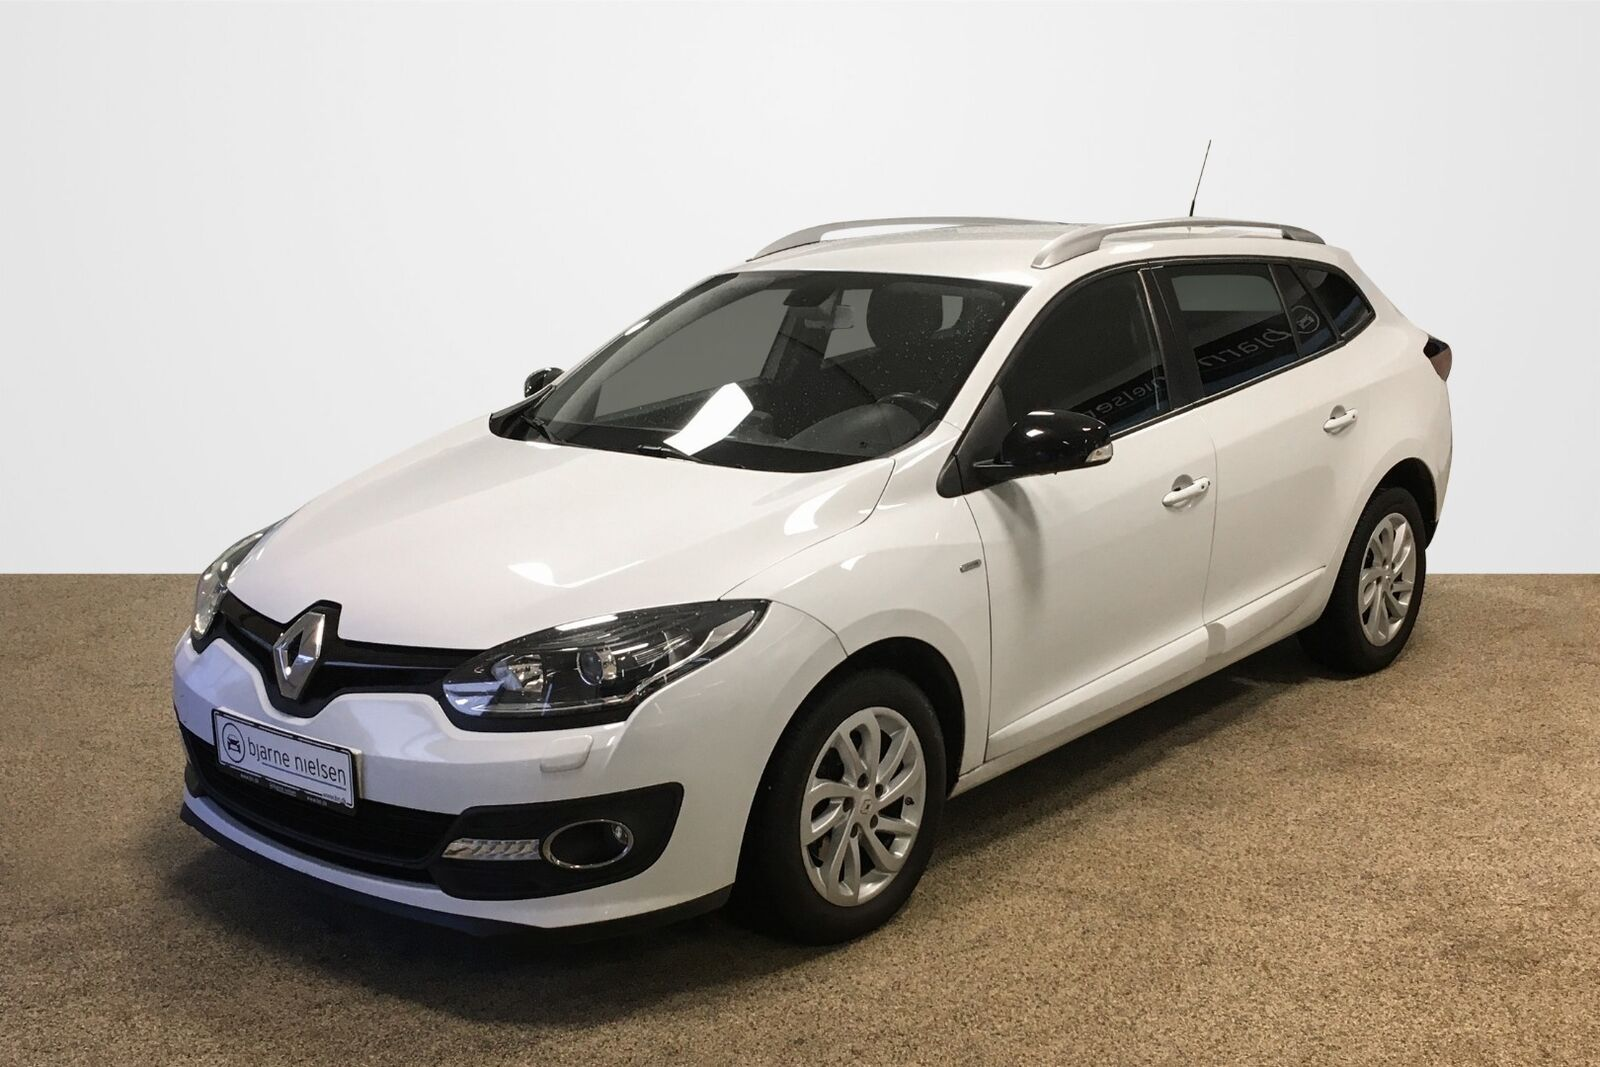 Renault Megane III Billede 4